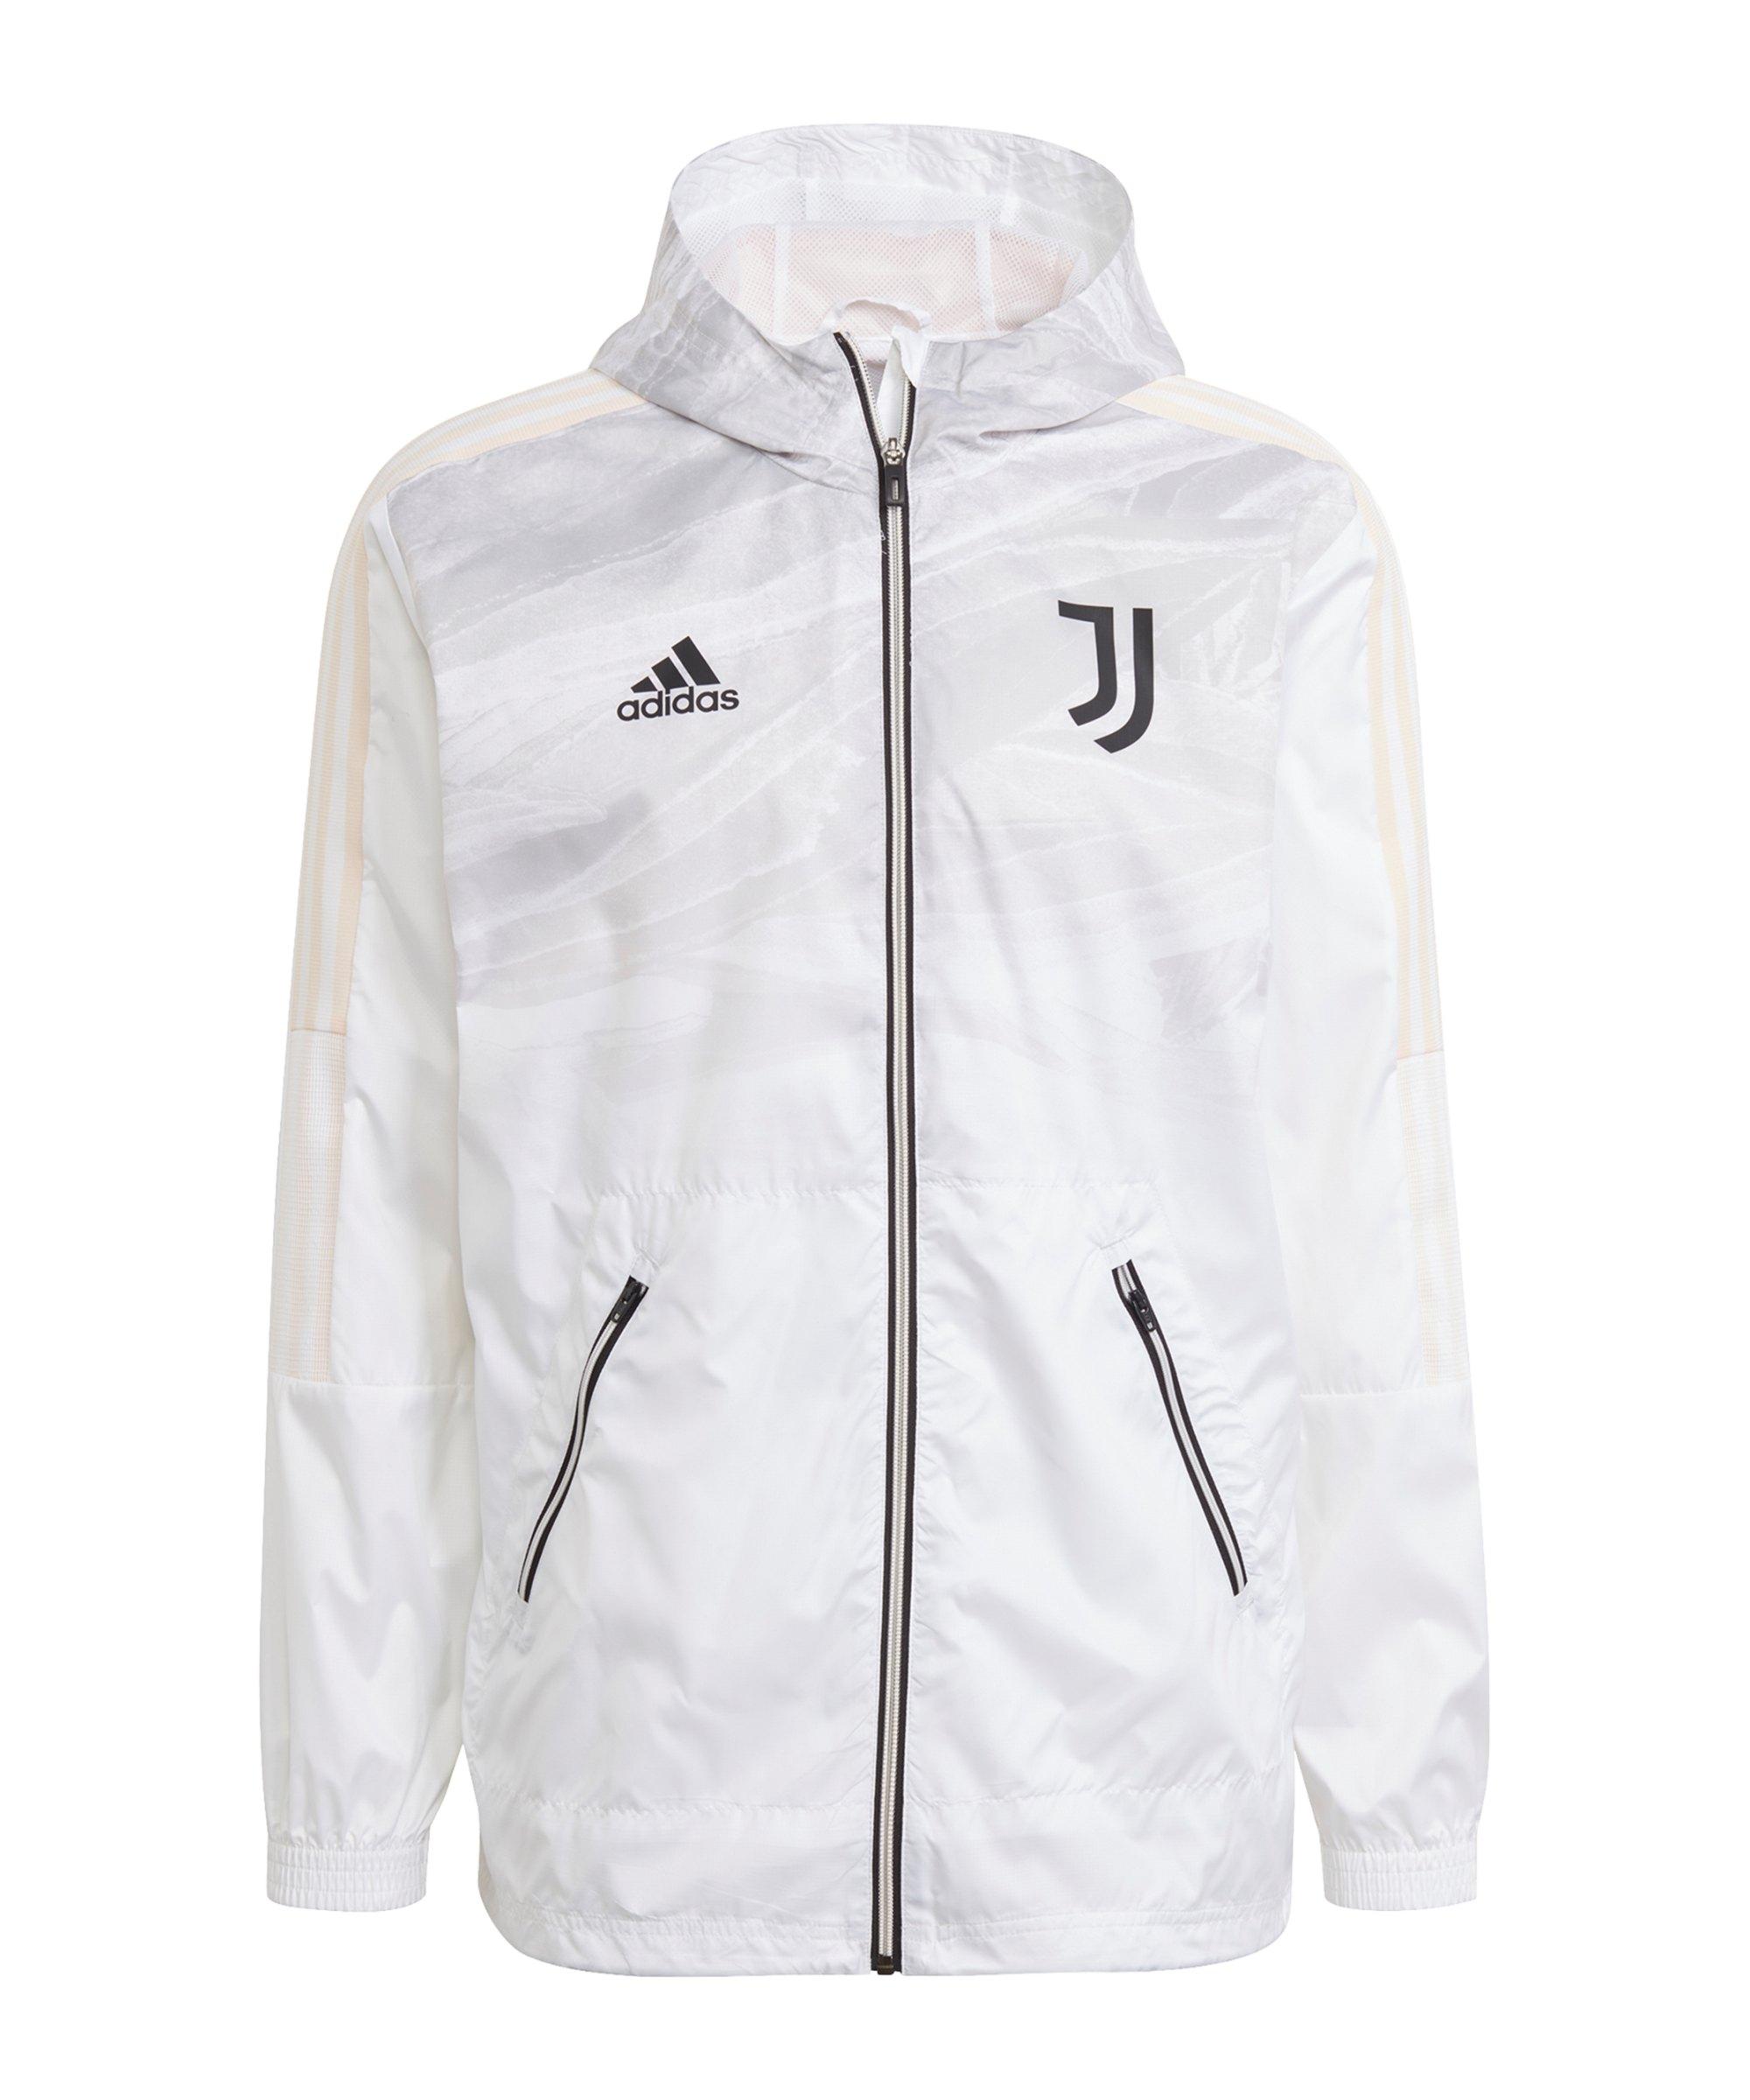 adidas Juventus Turin Windbreaker Weiss - weiss